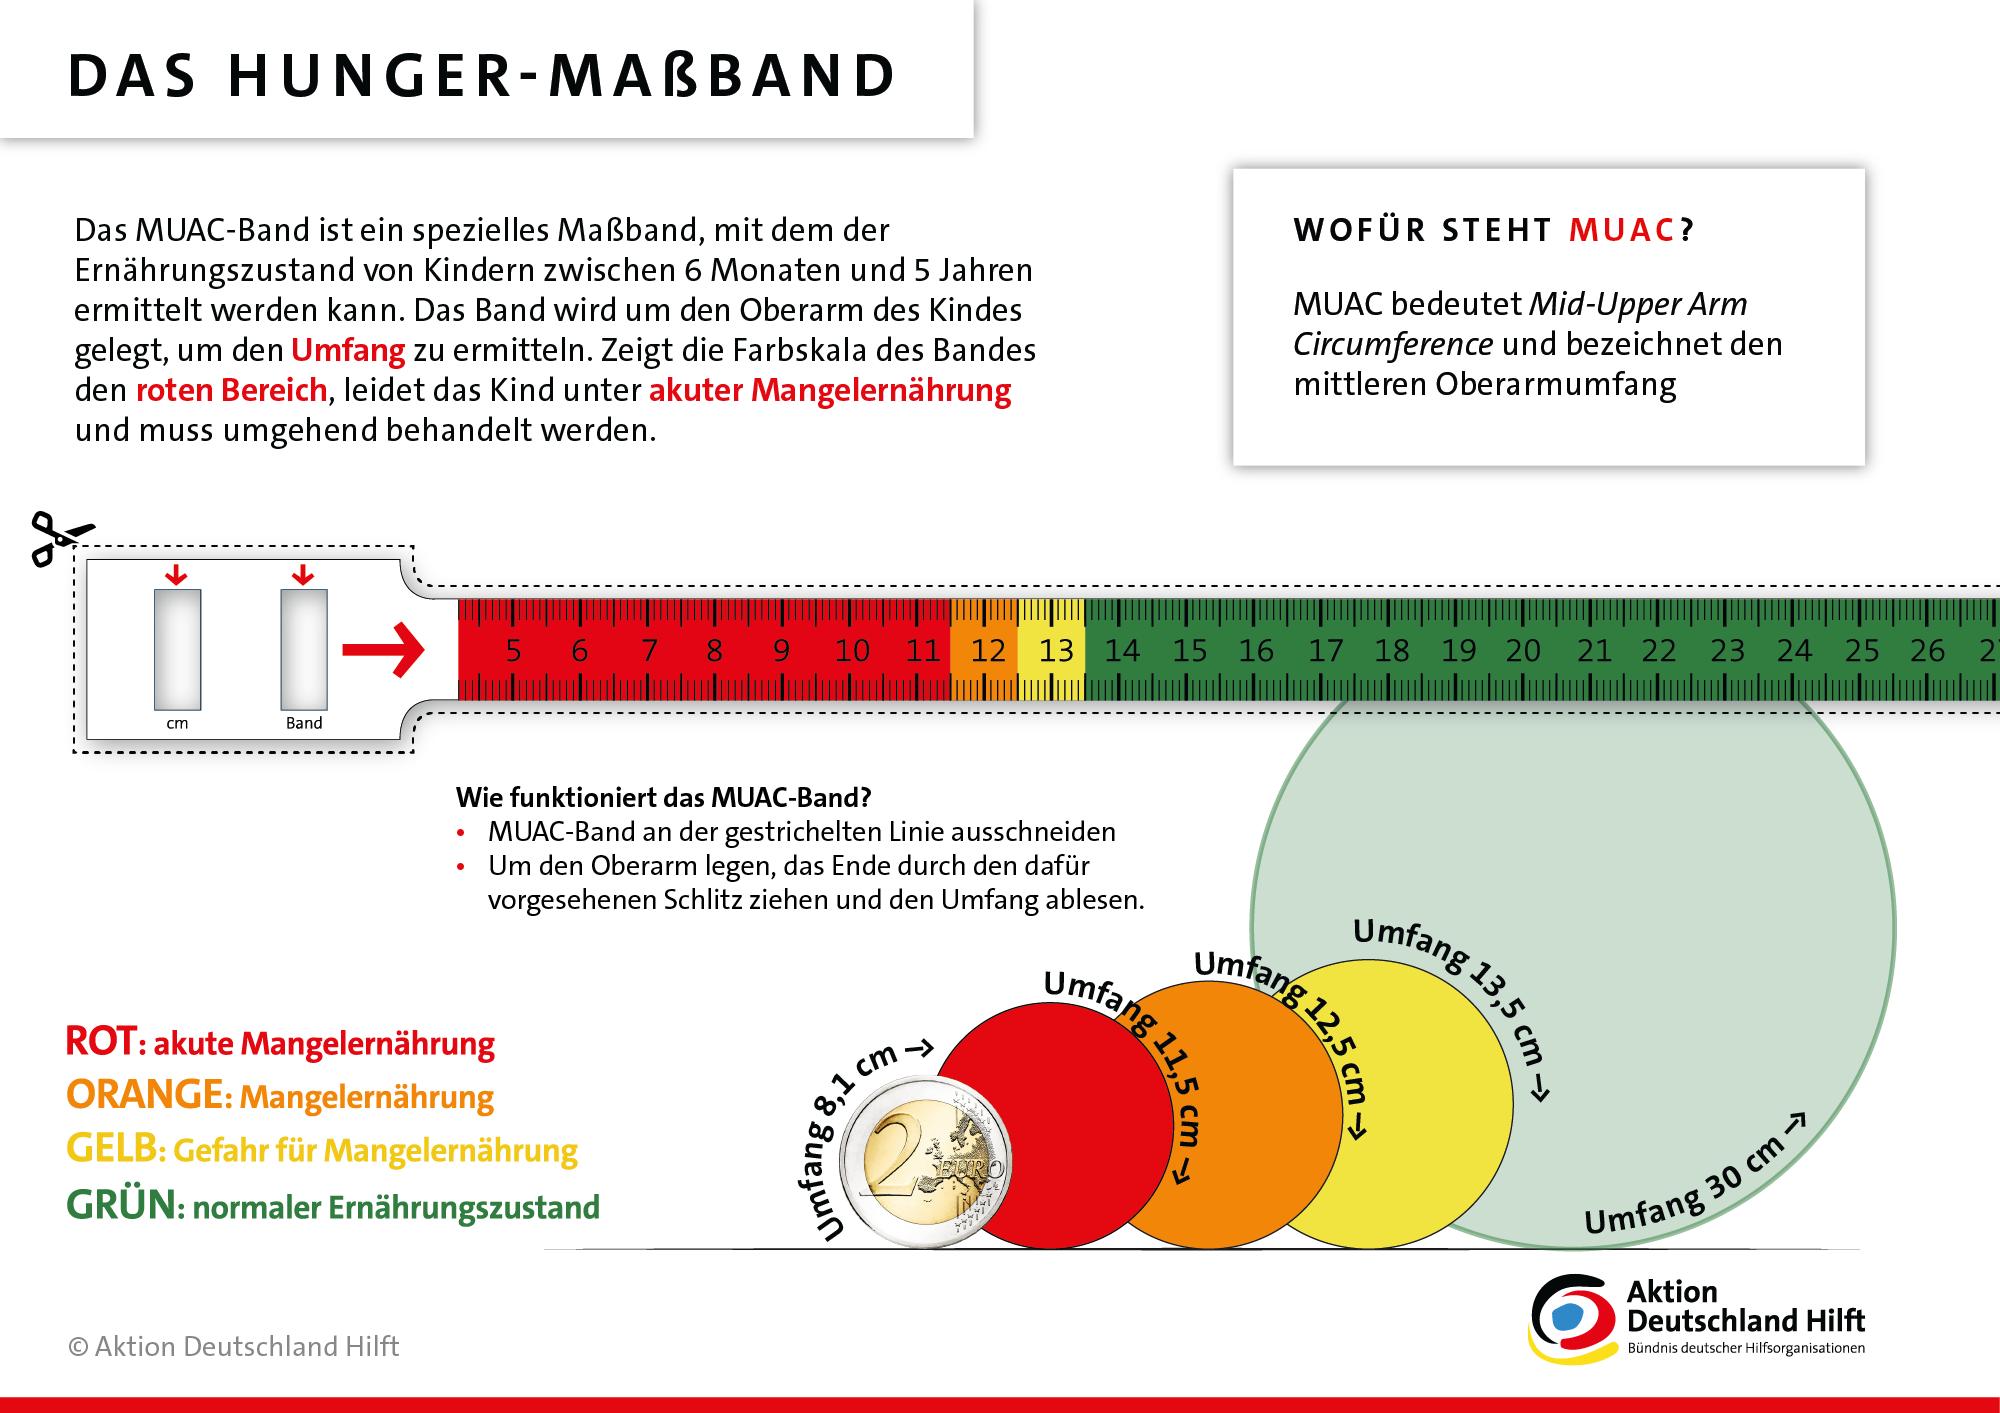 Infografik: Das Hunger-Maßband. Aktion Deutschland Hilft